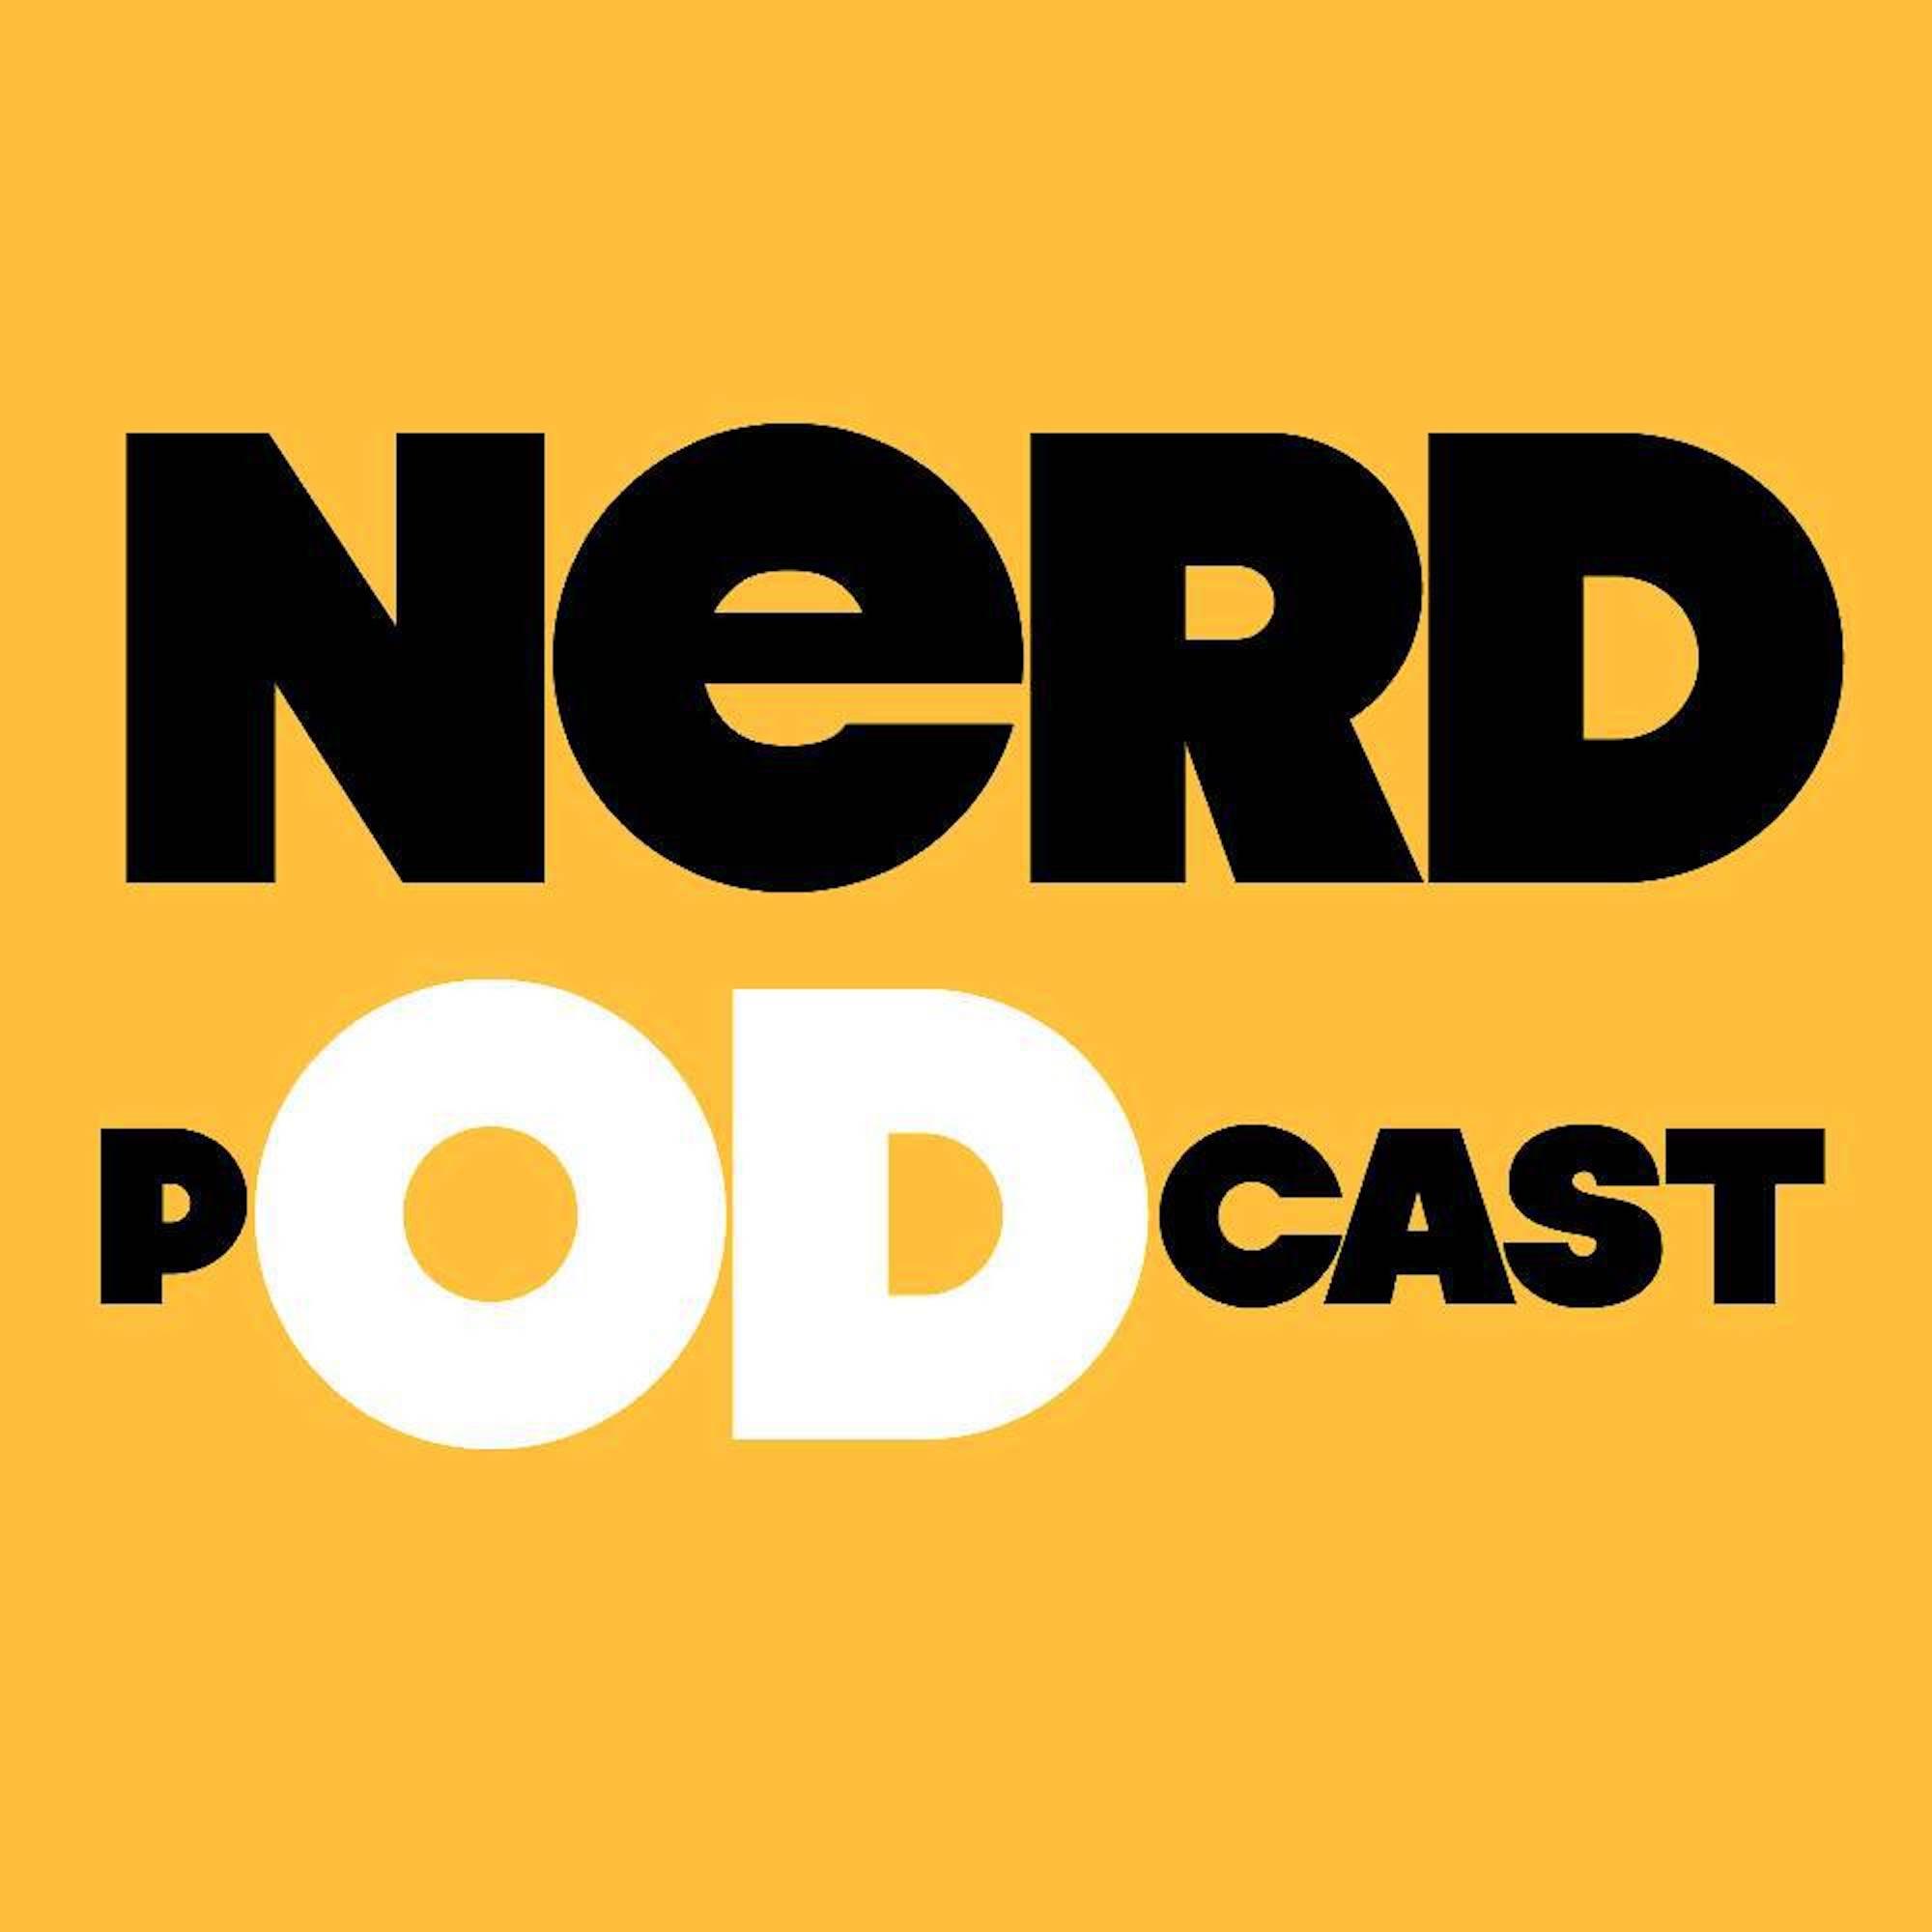 Nerd OD Podcast by NOD Network on Apple Podcasts